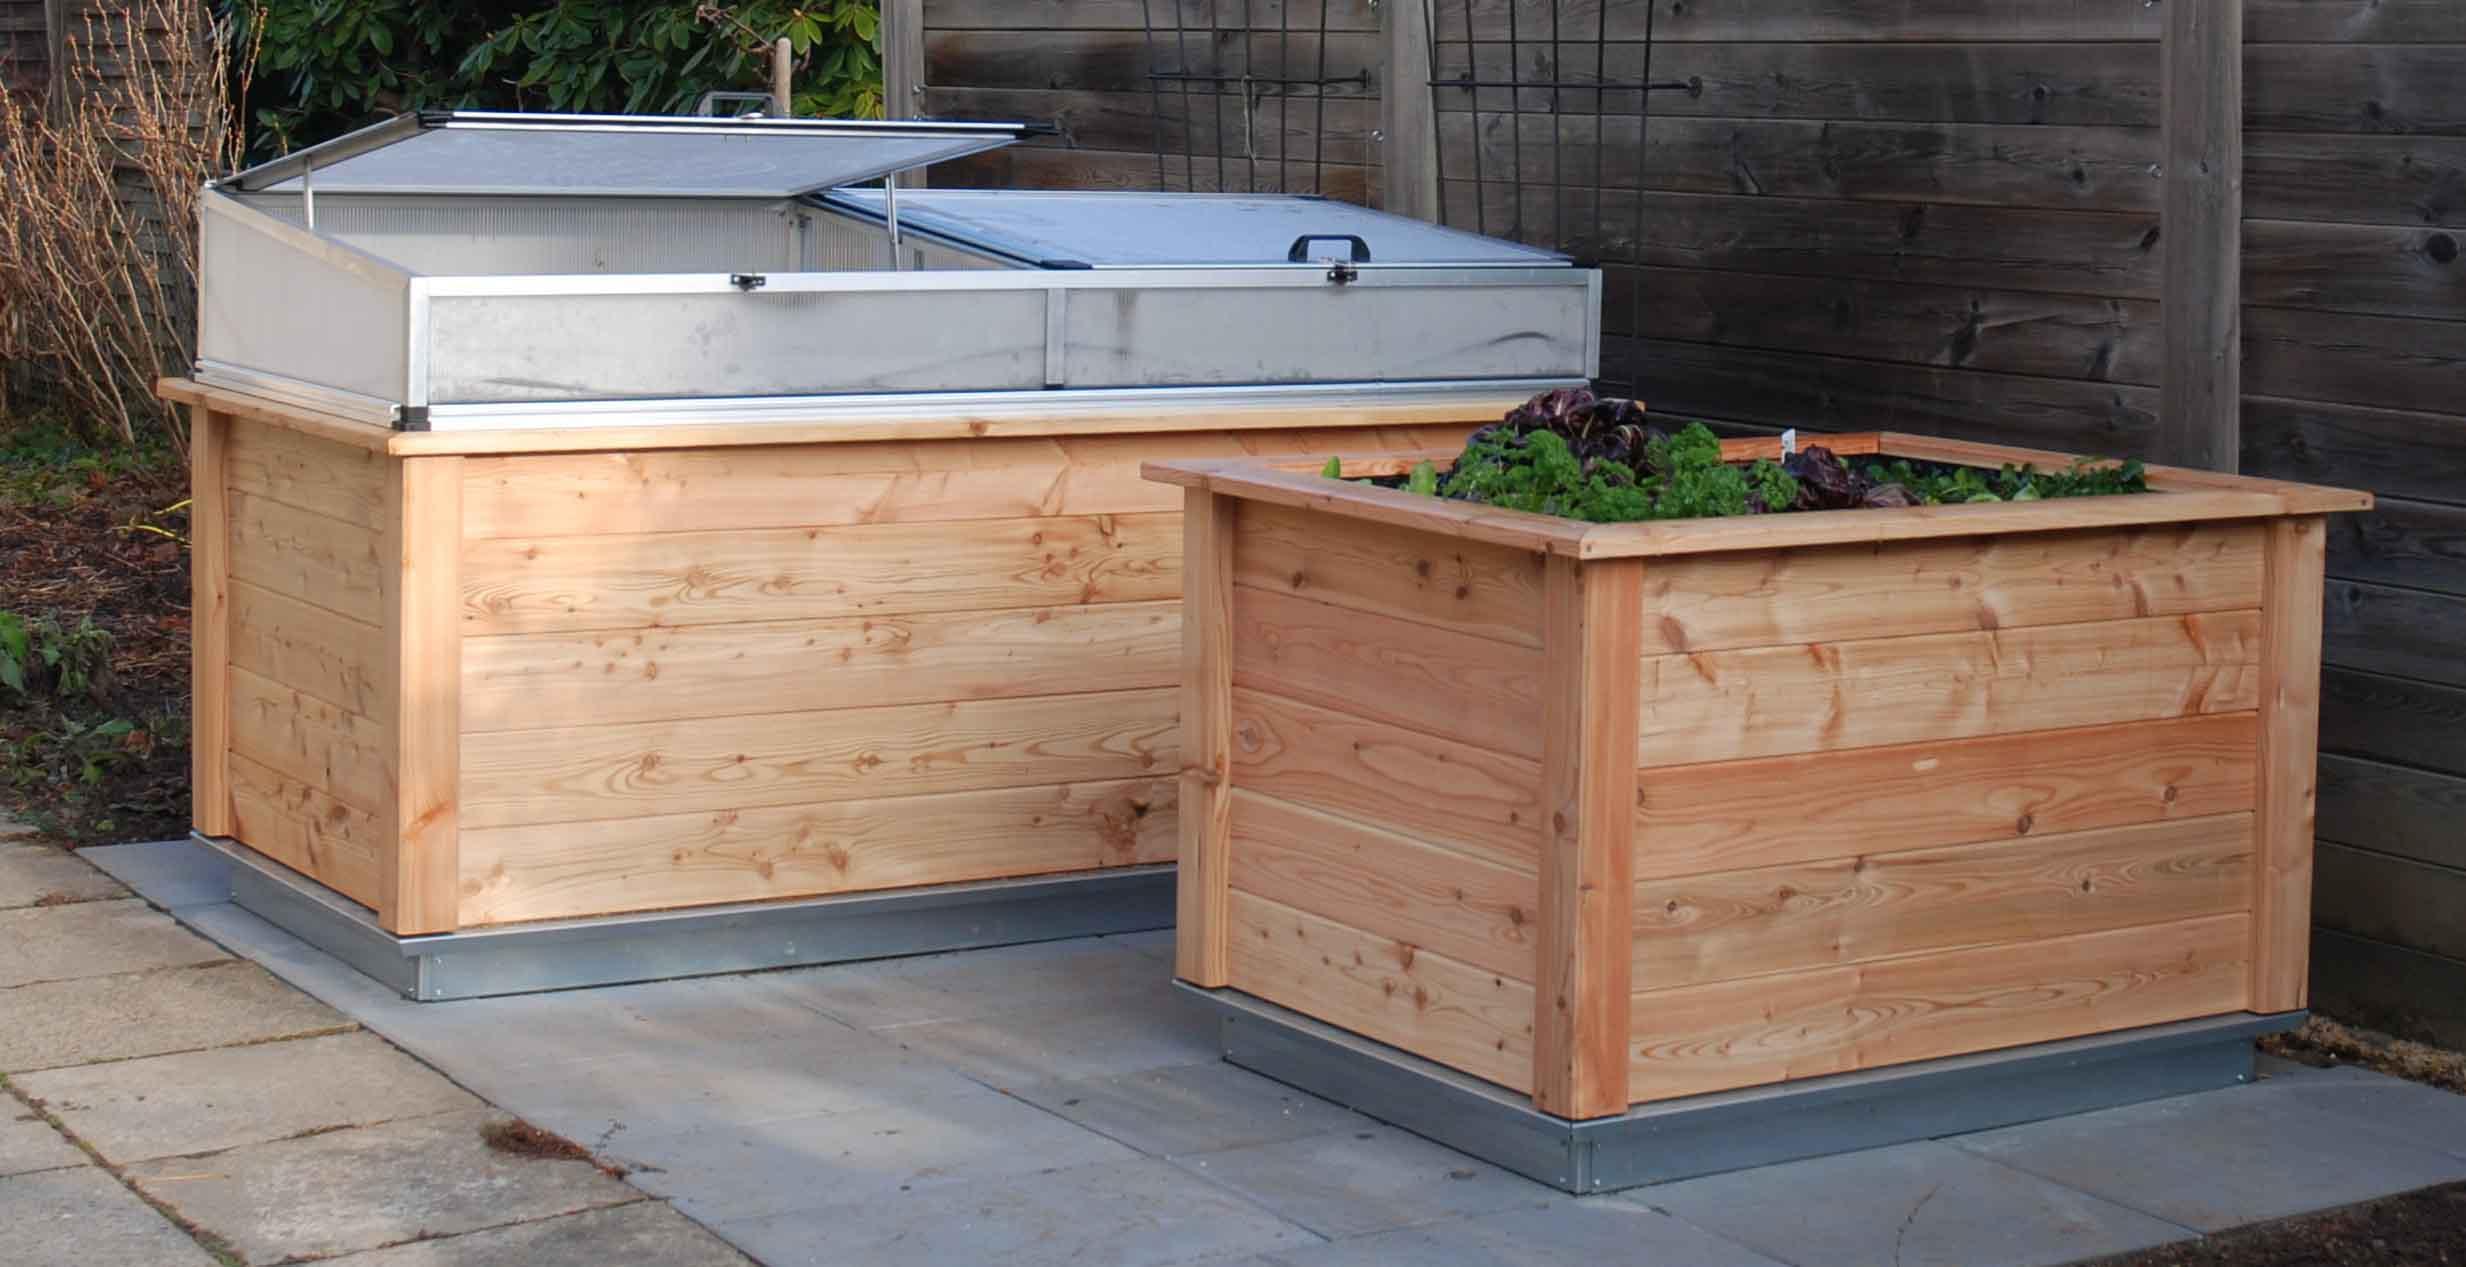 botanicum gmbh hochbeet larix 130 und larix 210. Black Bedroom Furniture Sets. Home Design Ideas